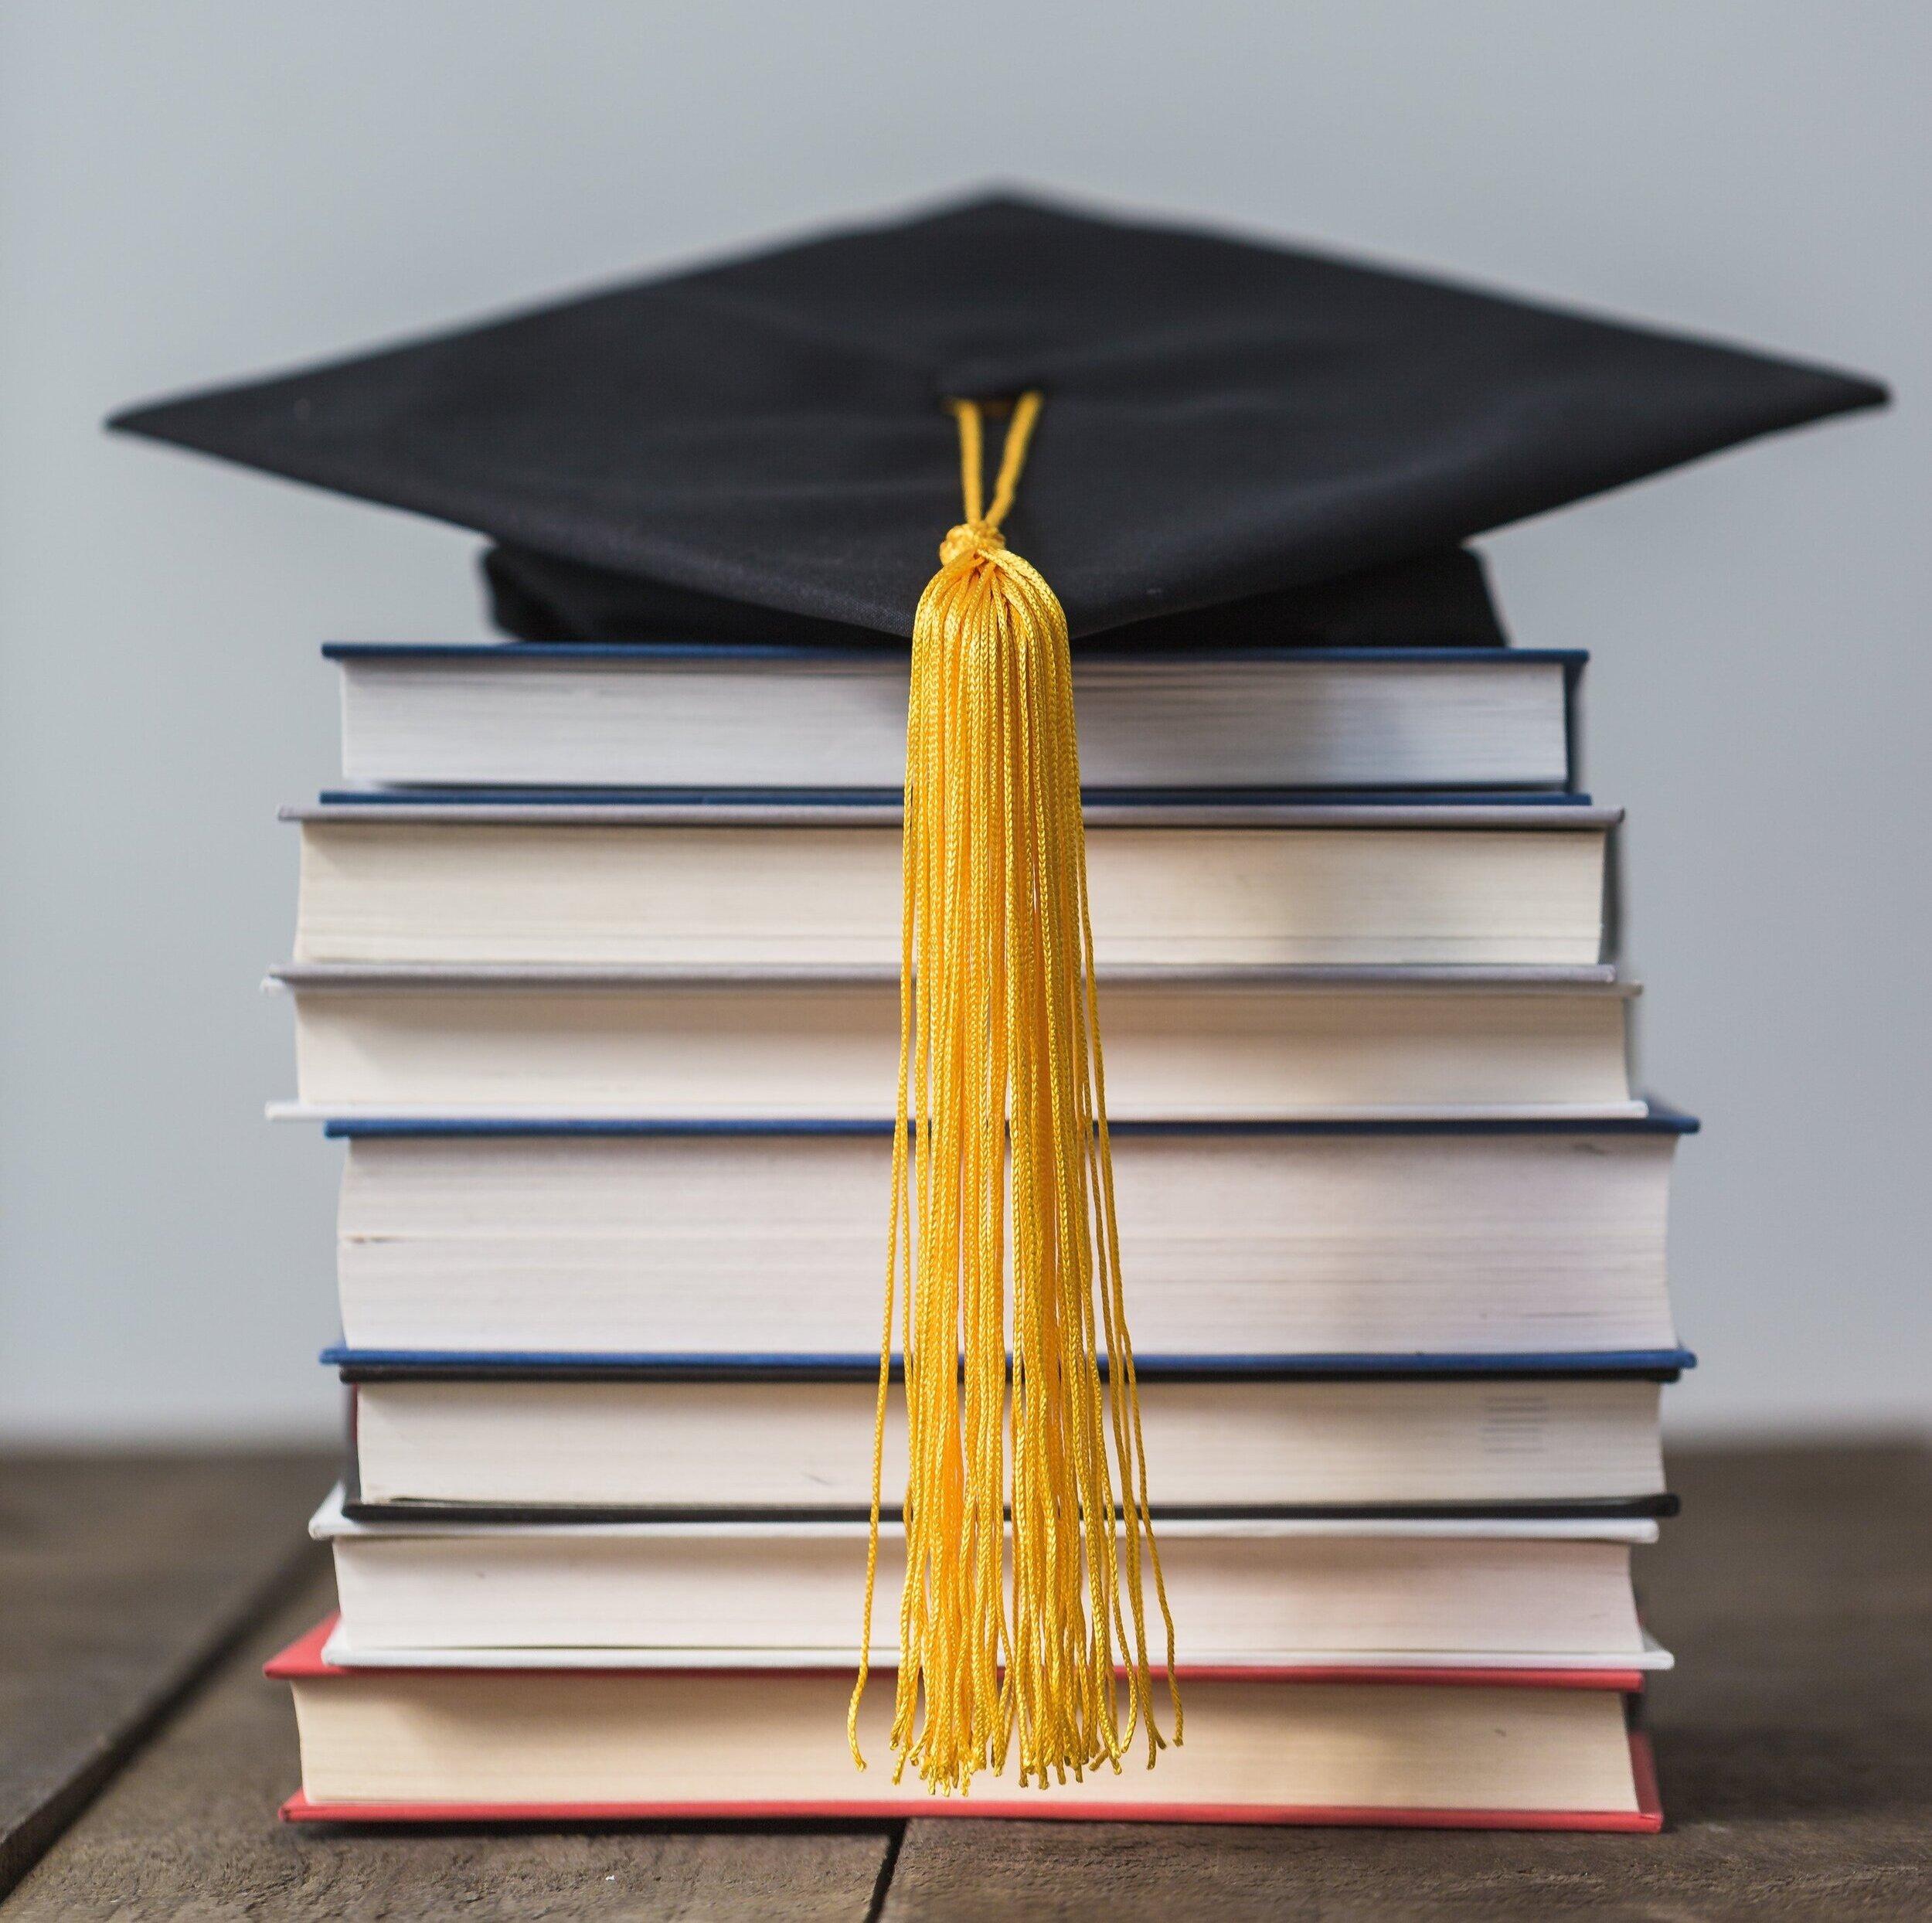 books-and-graduation-cap.jpg